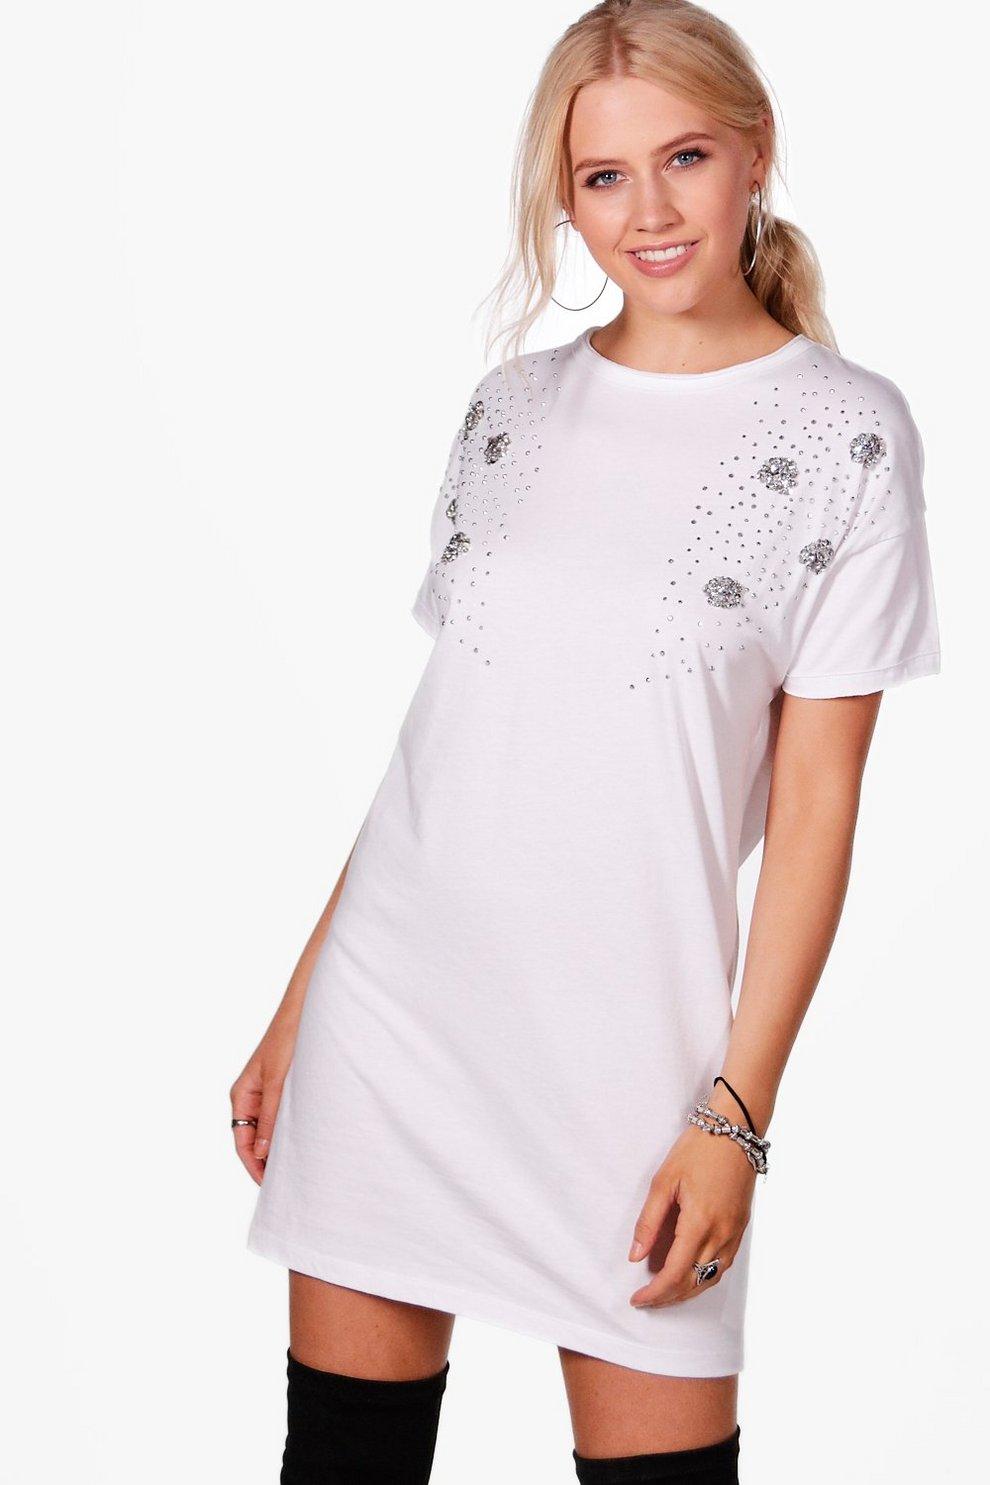 e479996100b7 Womens White Nora Embellished T-shirt Dress